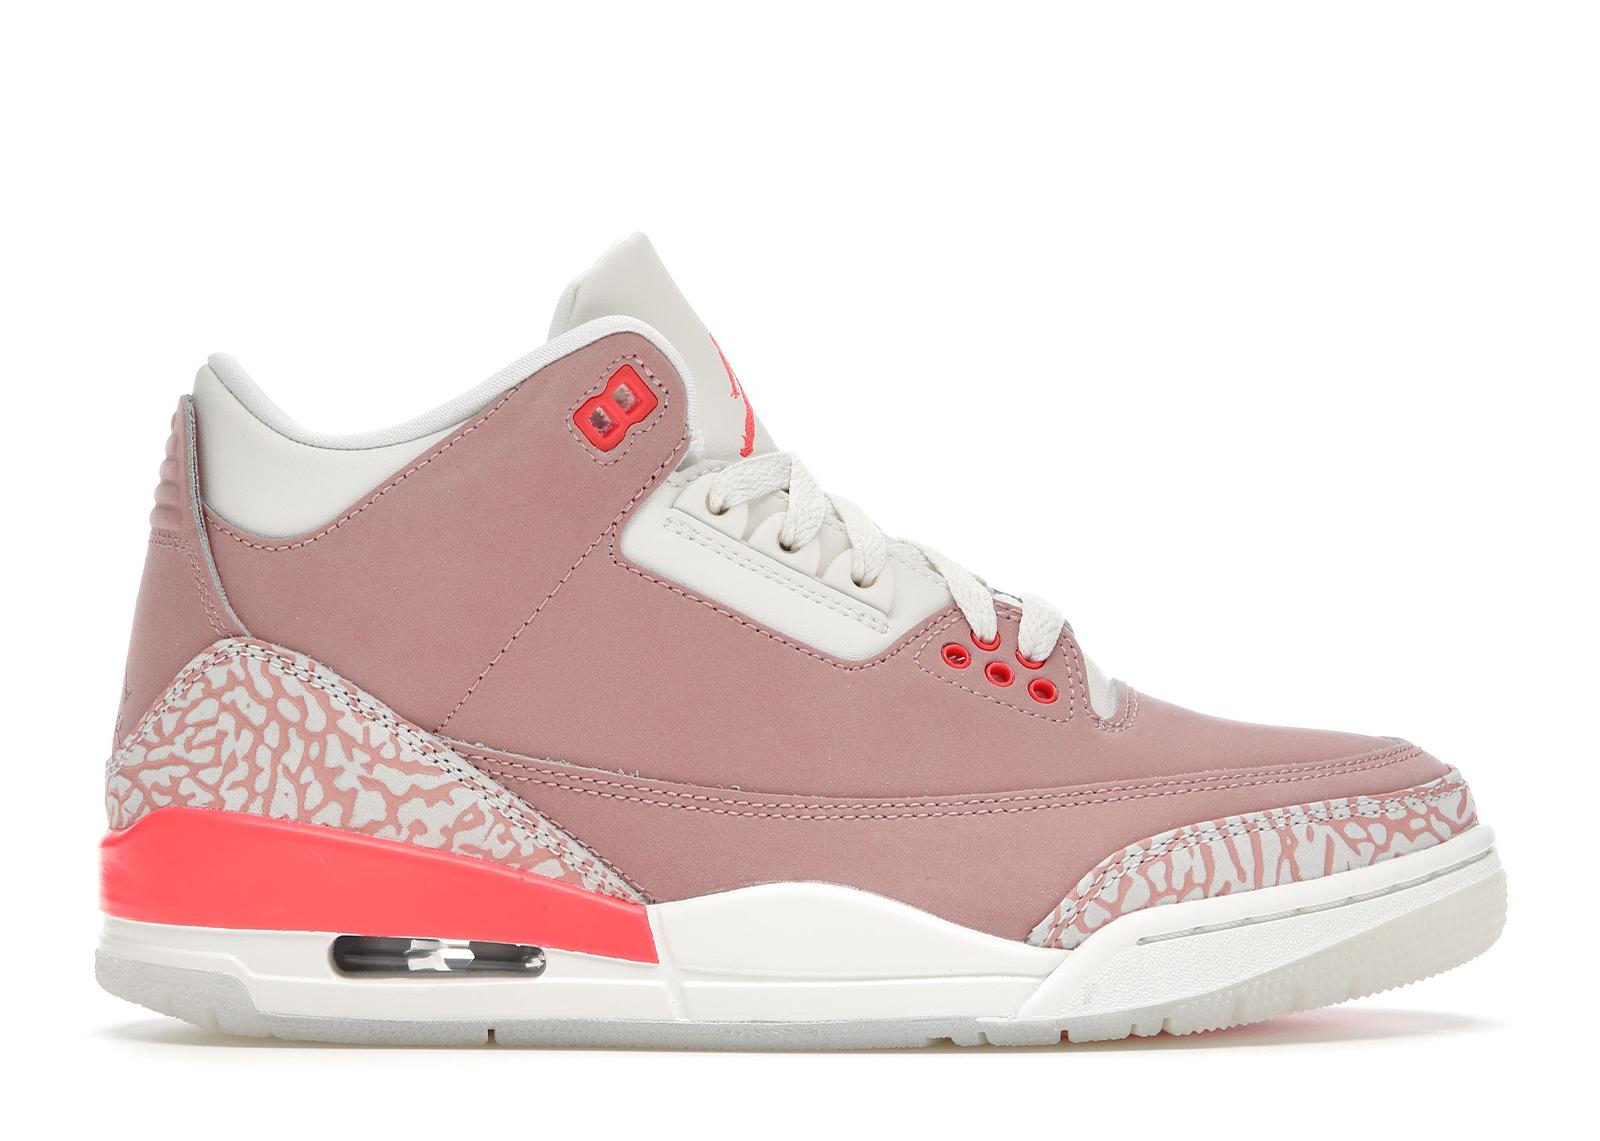 Jordan 3 Retro Rust Pink (W)